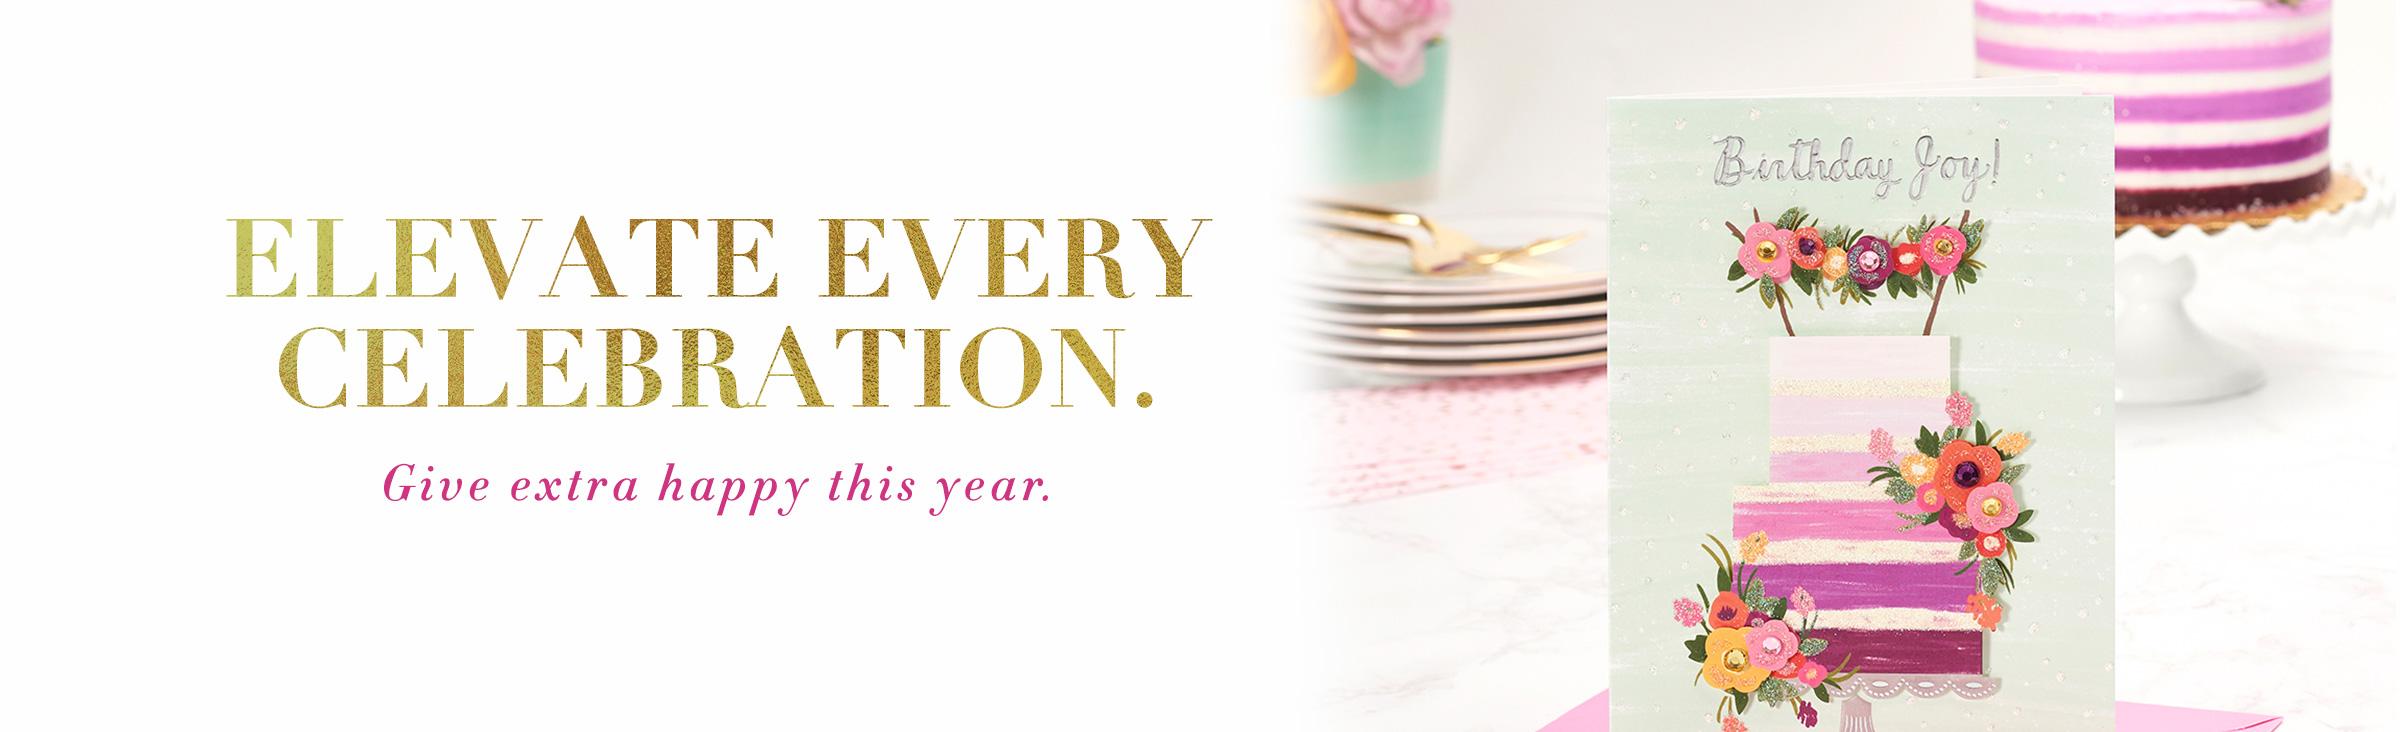 Purple cake with flowers birthday greeting card